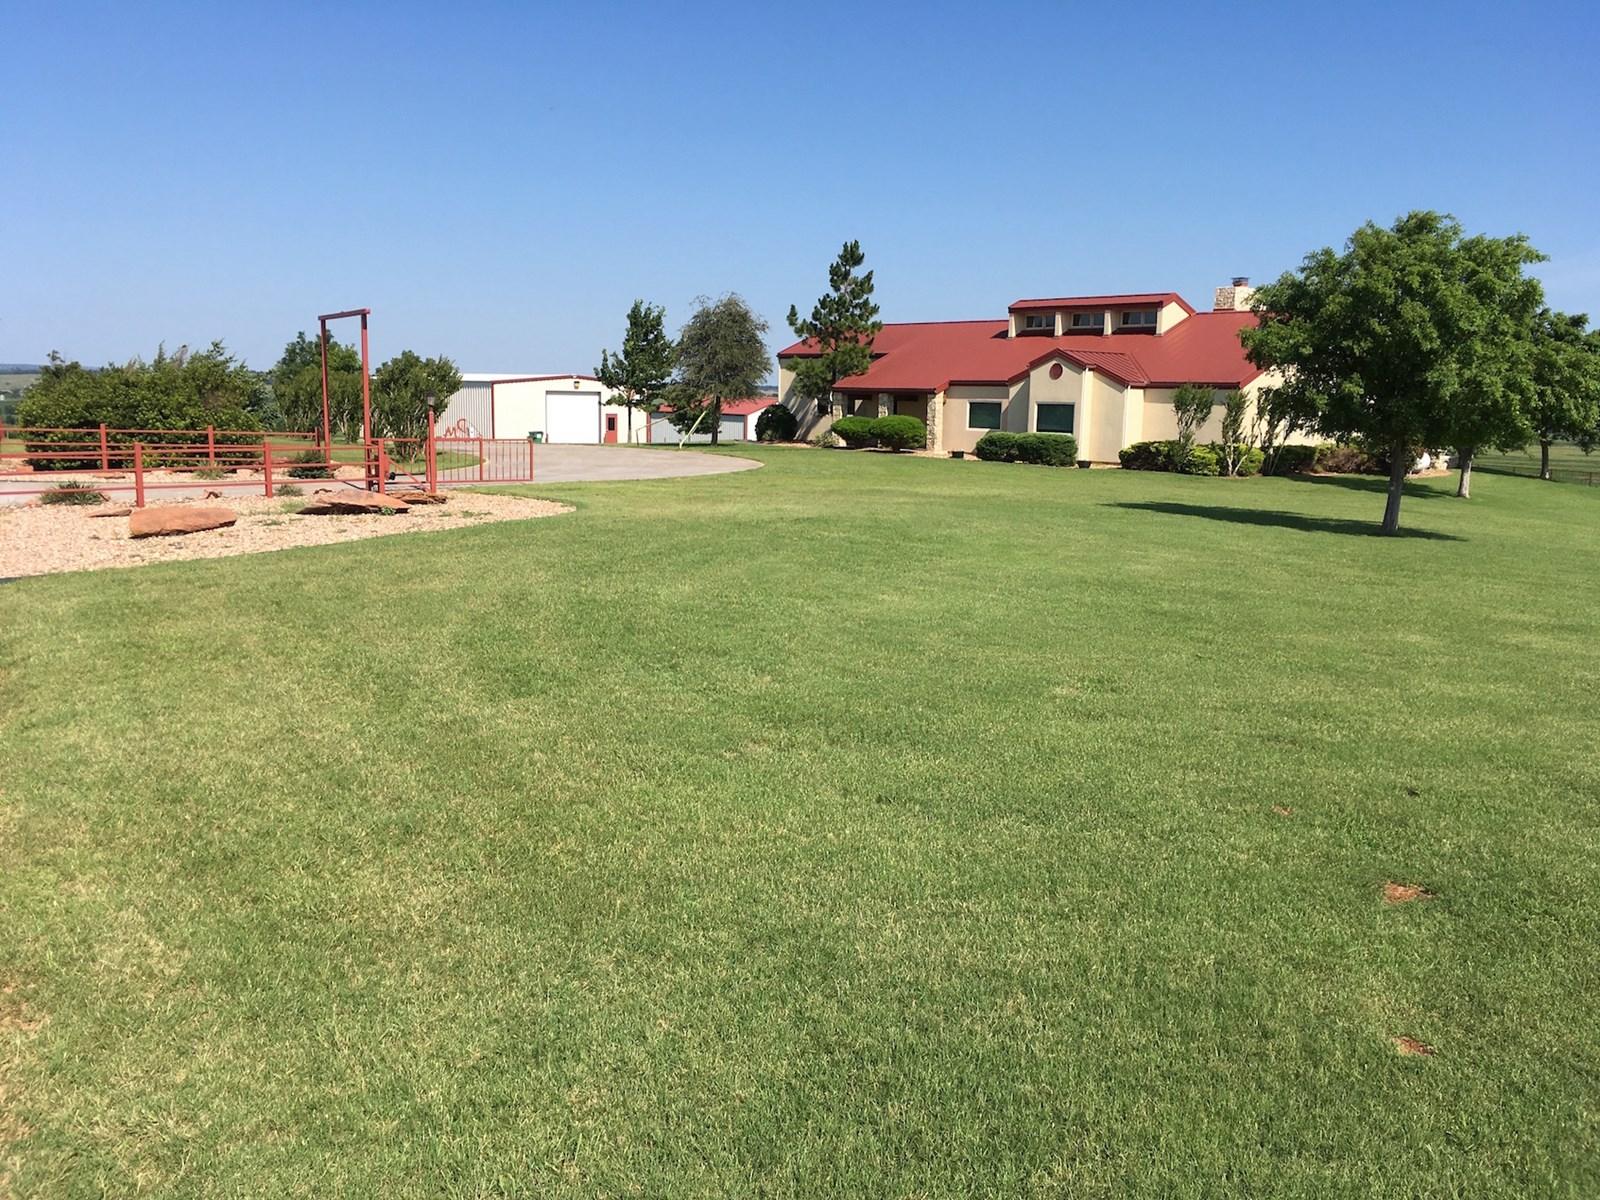 HOME  ACREAGE EQUIPMENT LAND FOR SALE NINNEKAH GRADY COUNTY OKLAHOMA